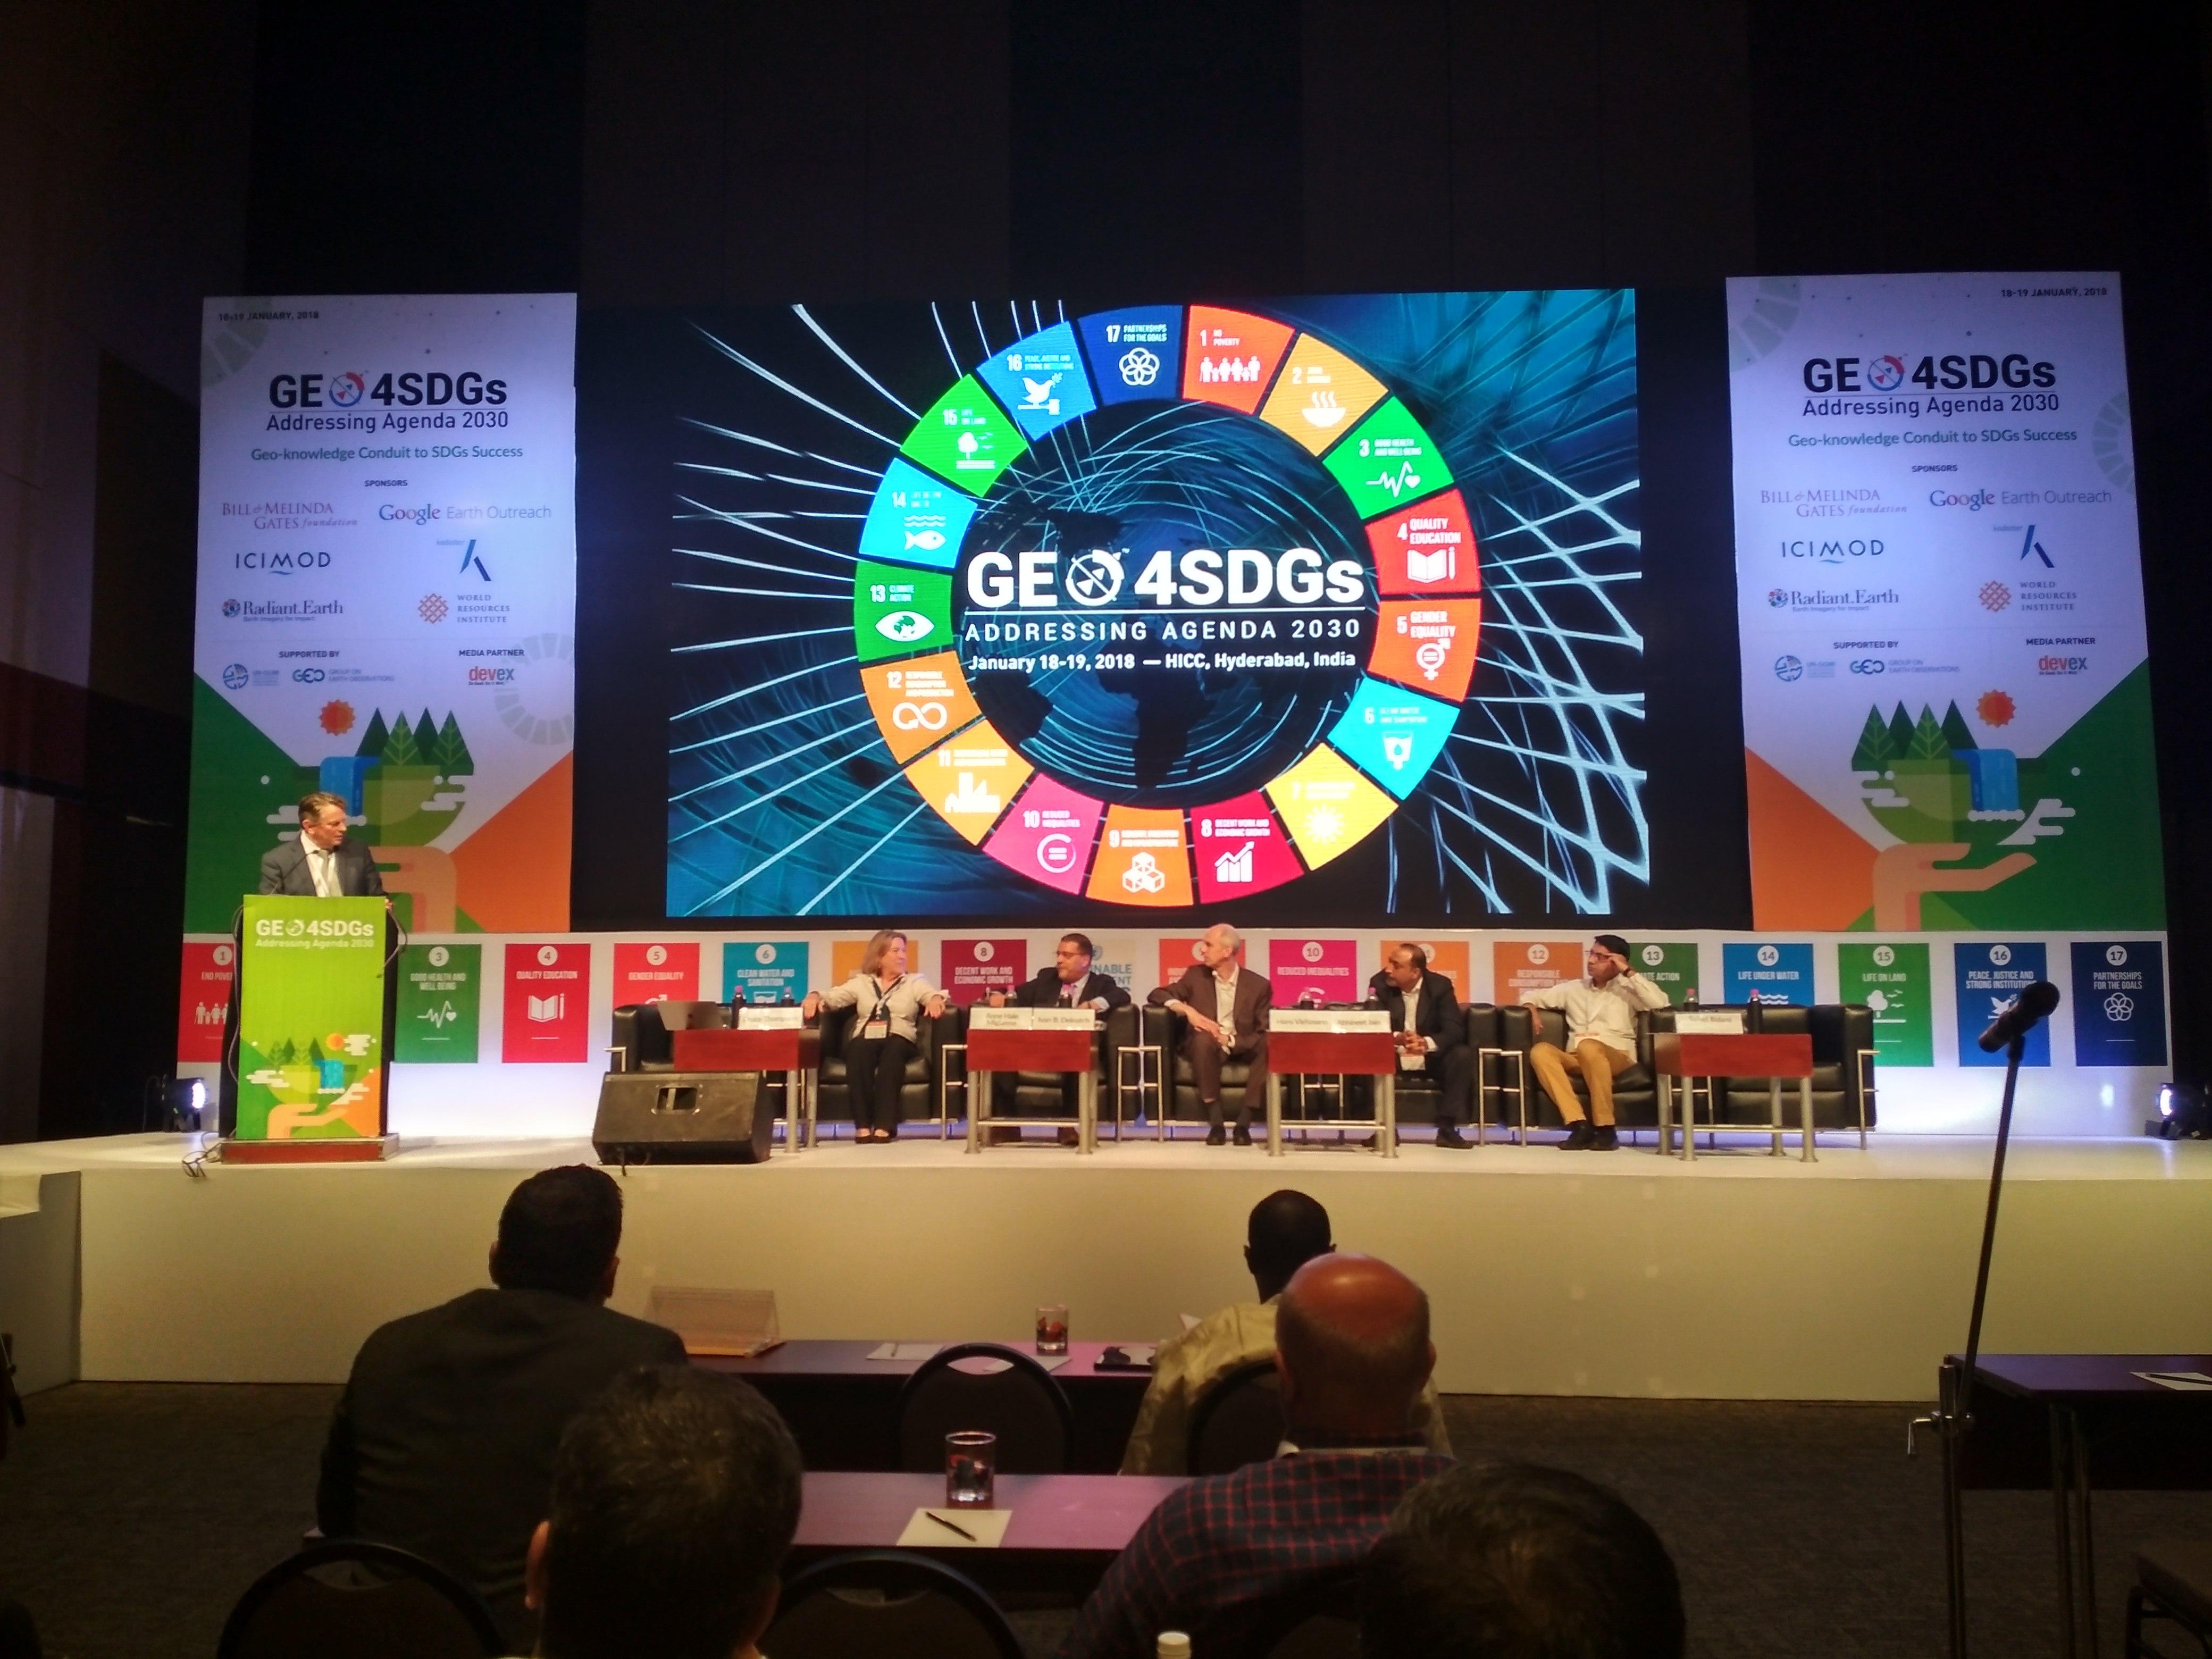 geospatial technologies and Big Data